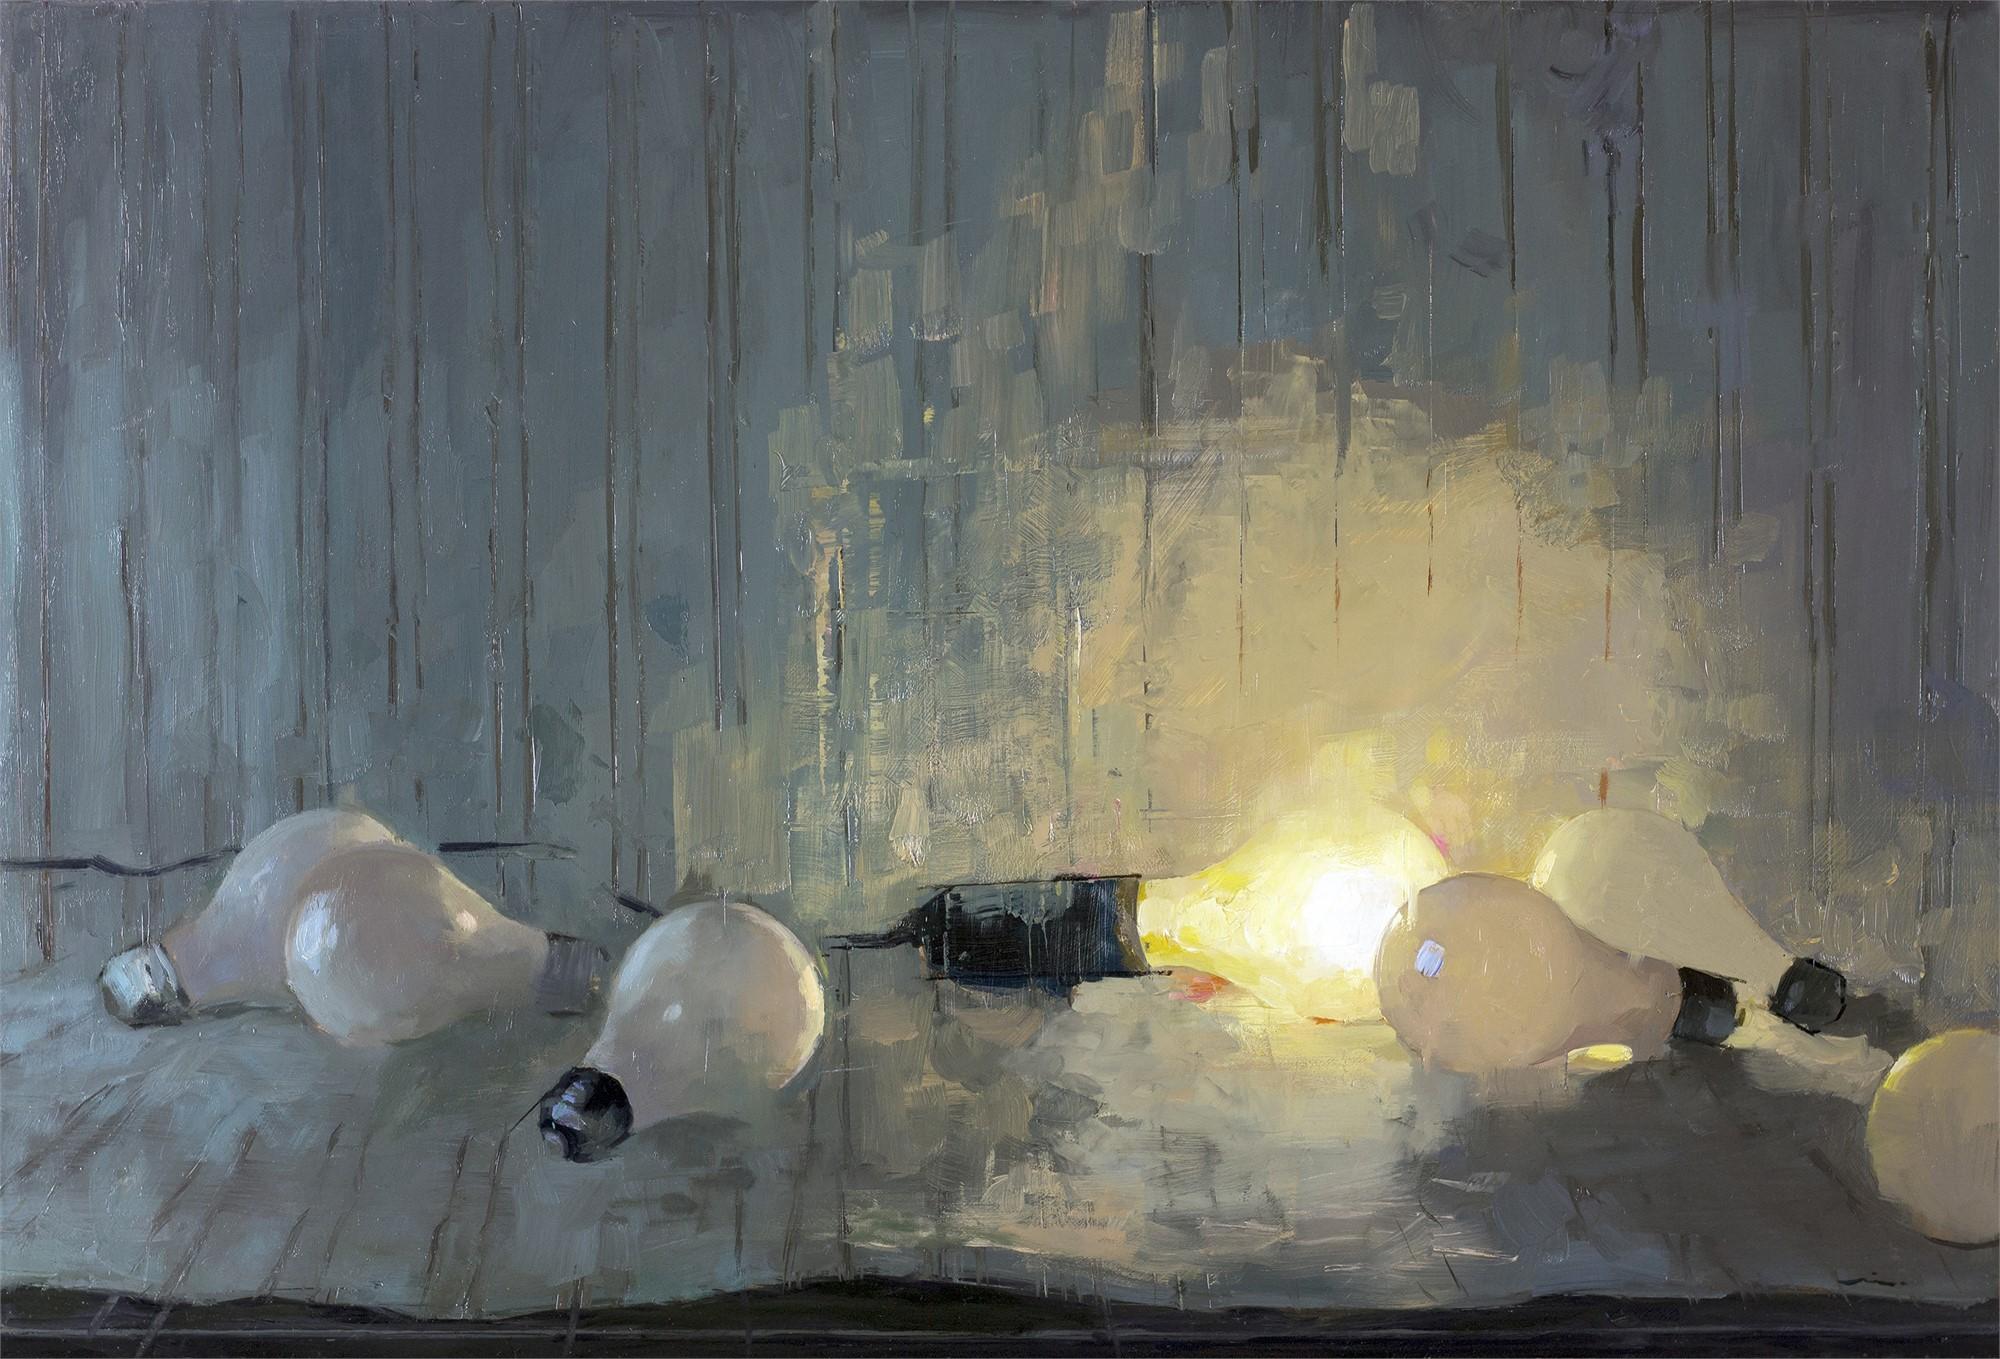 Phosphorescence by Mia Bergeron